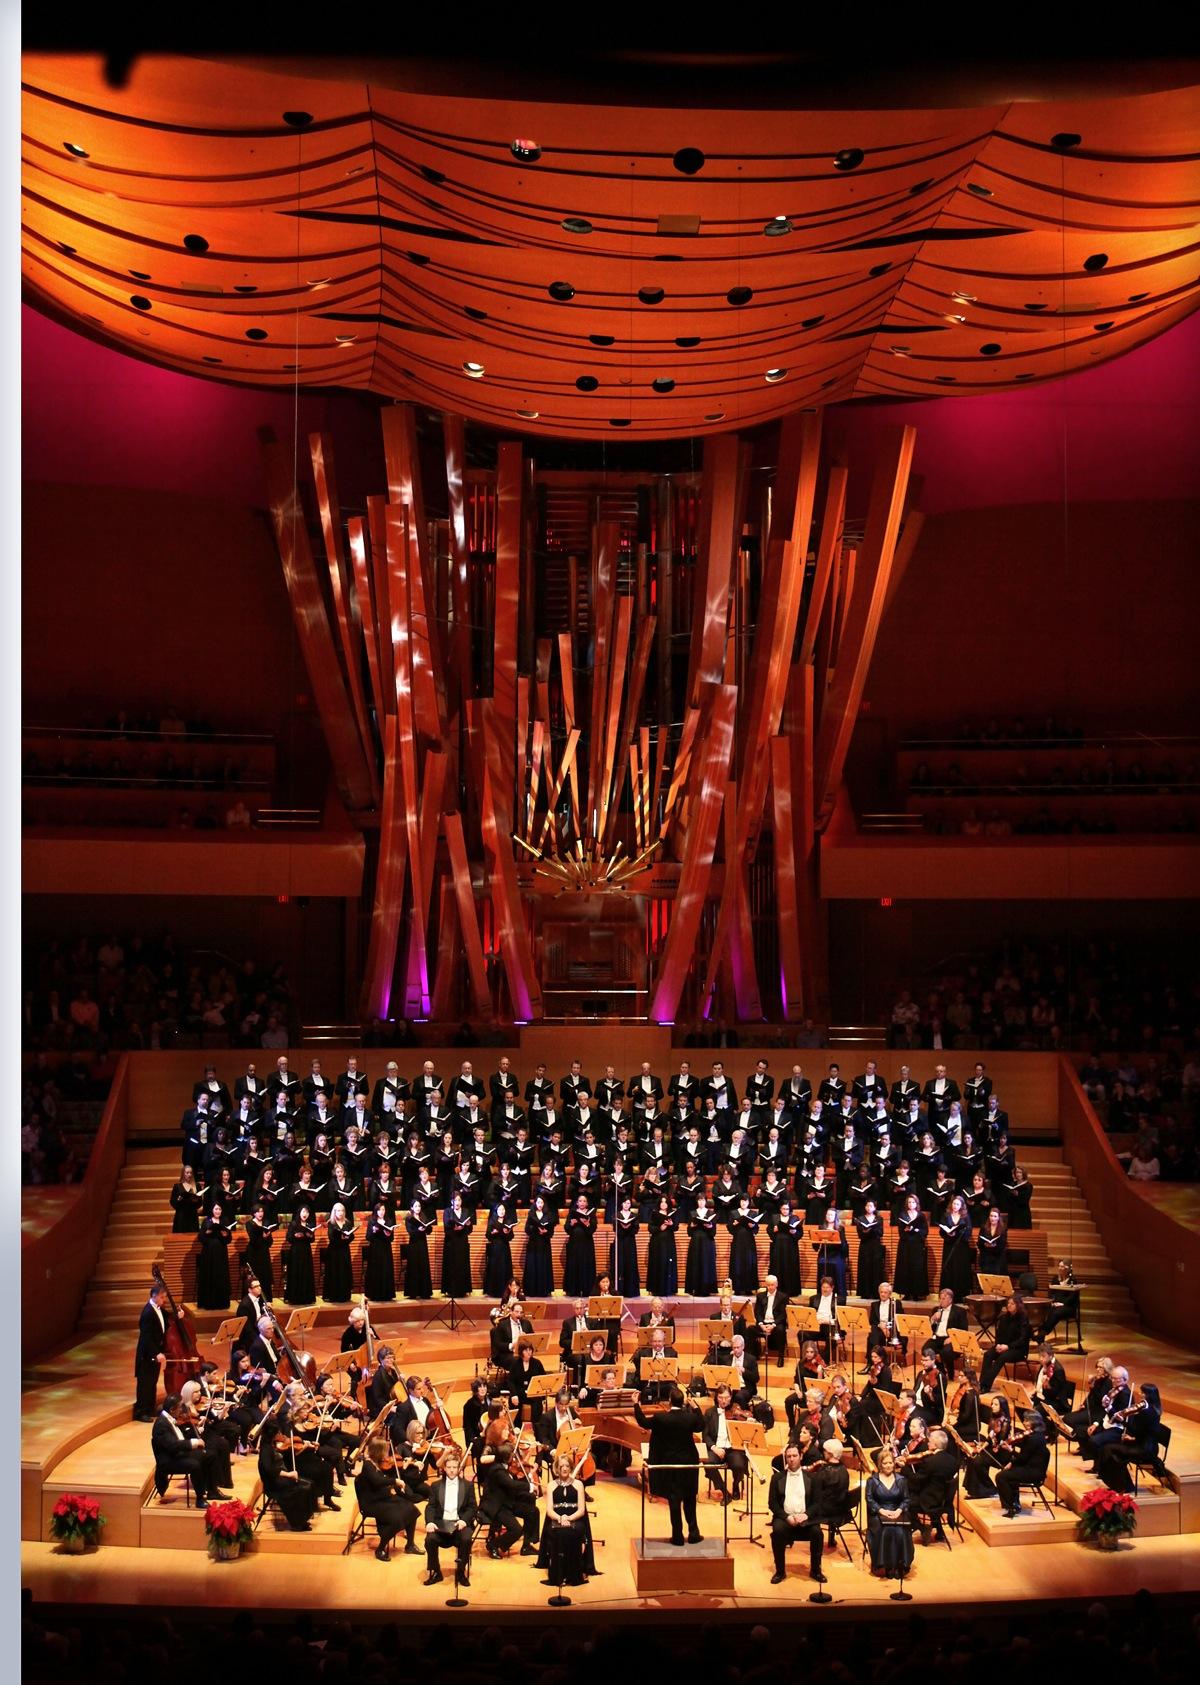 2010-12-21-Chorale3.jpg